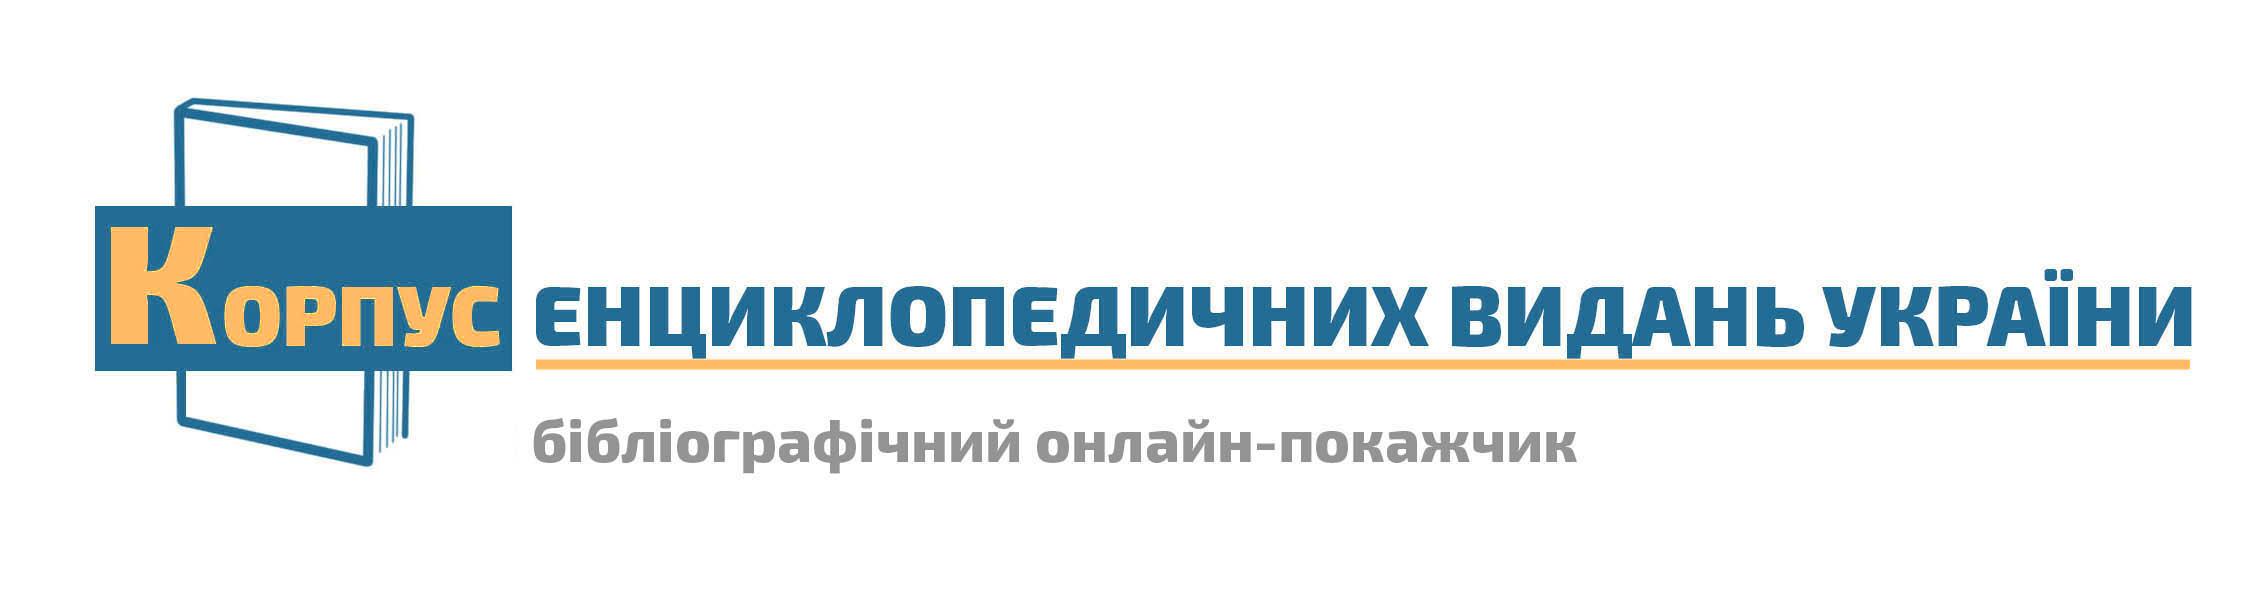 корпус енциклопедичних видань україни